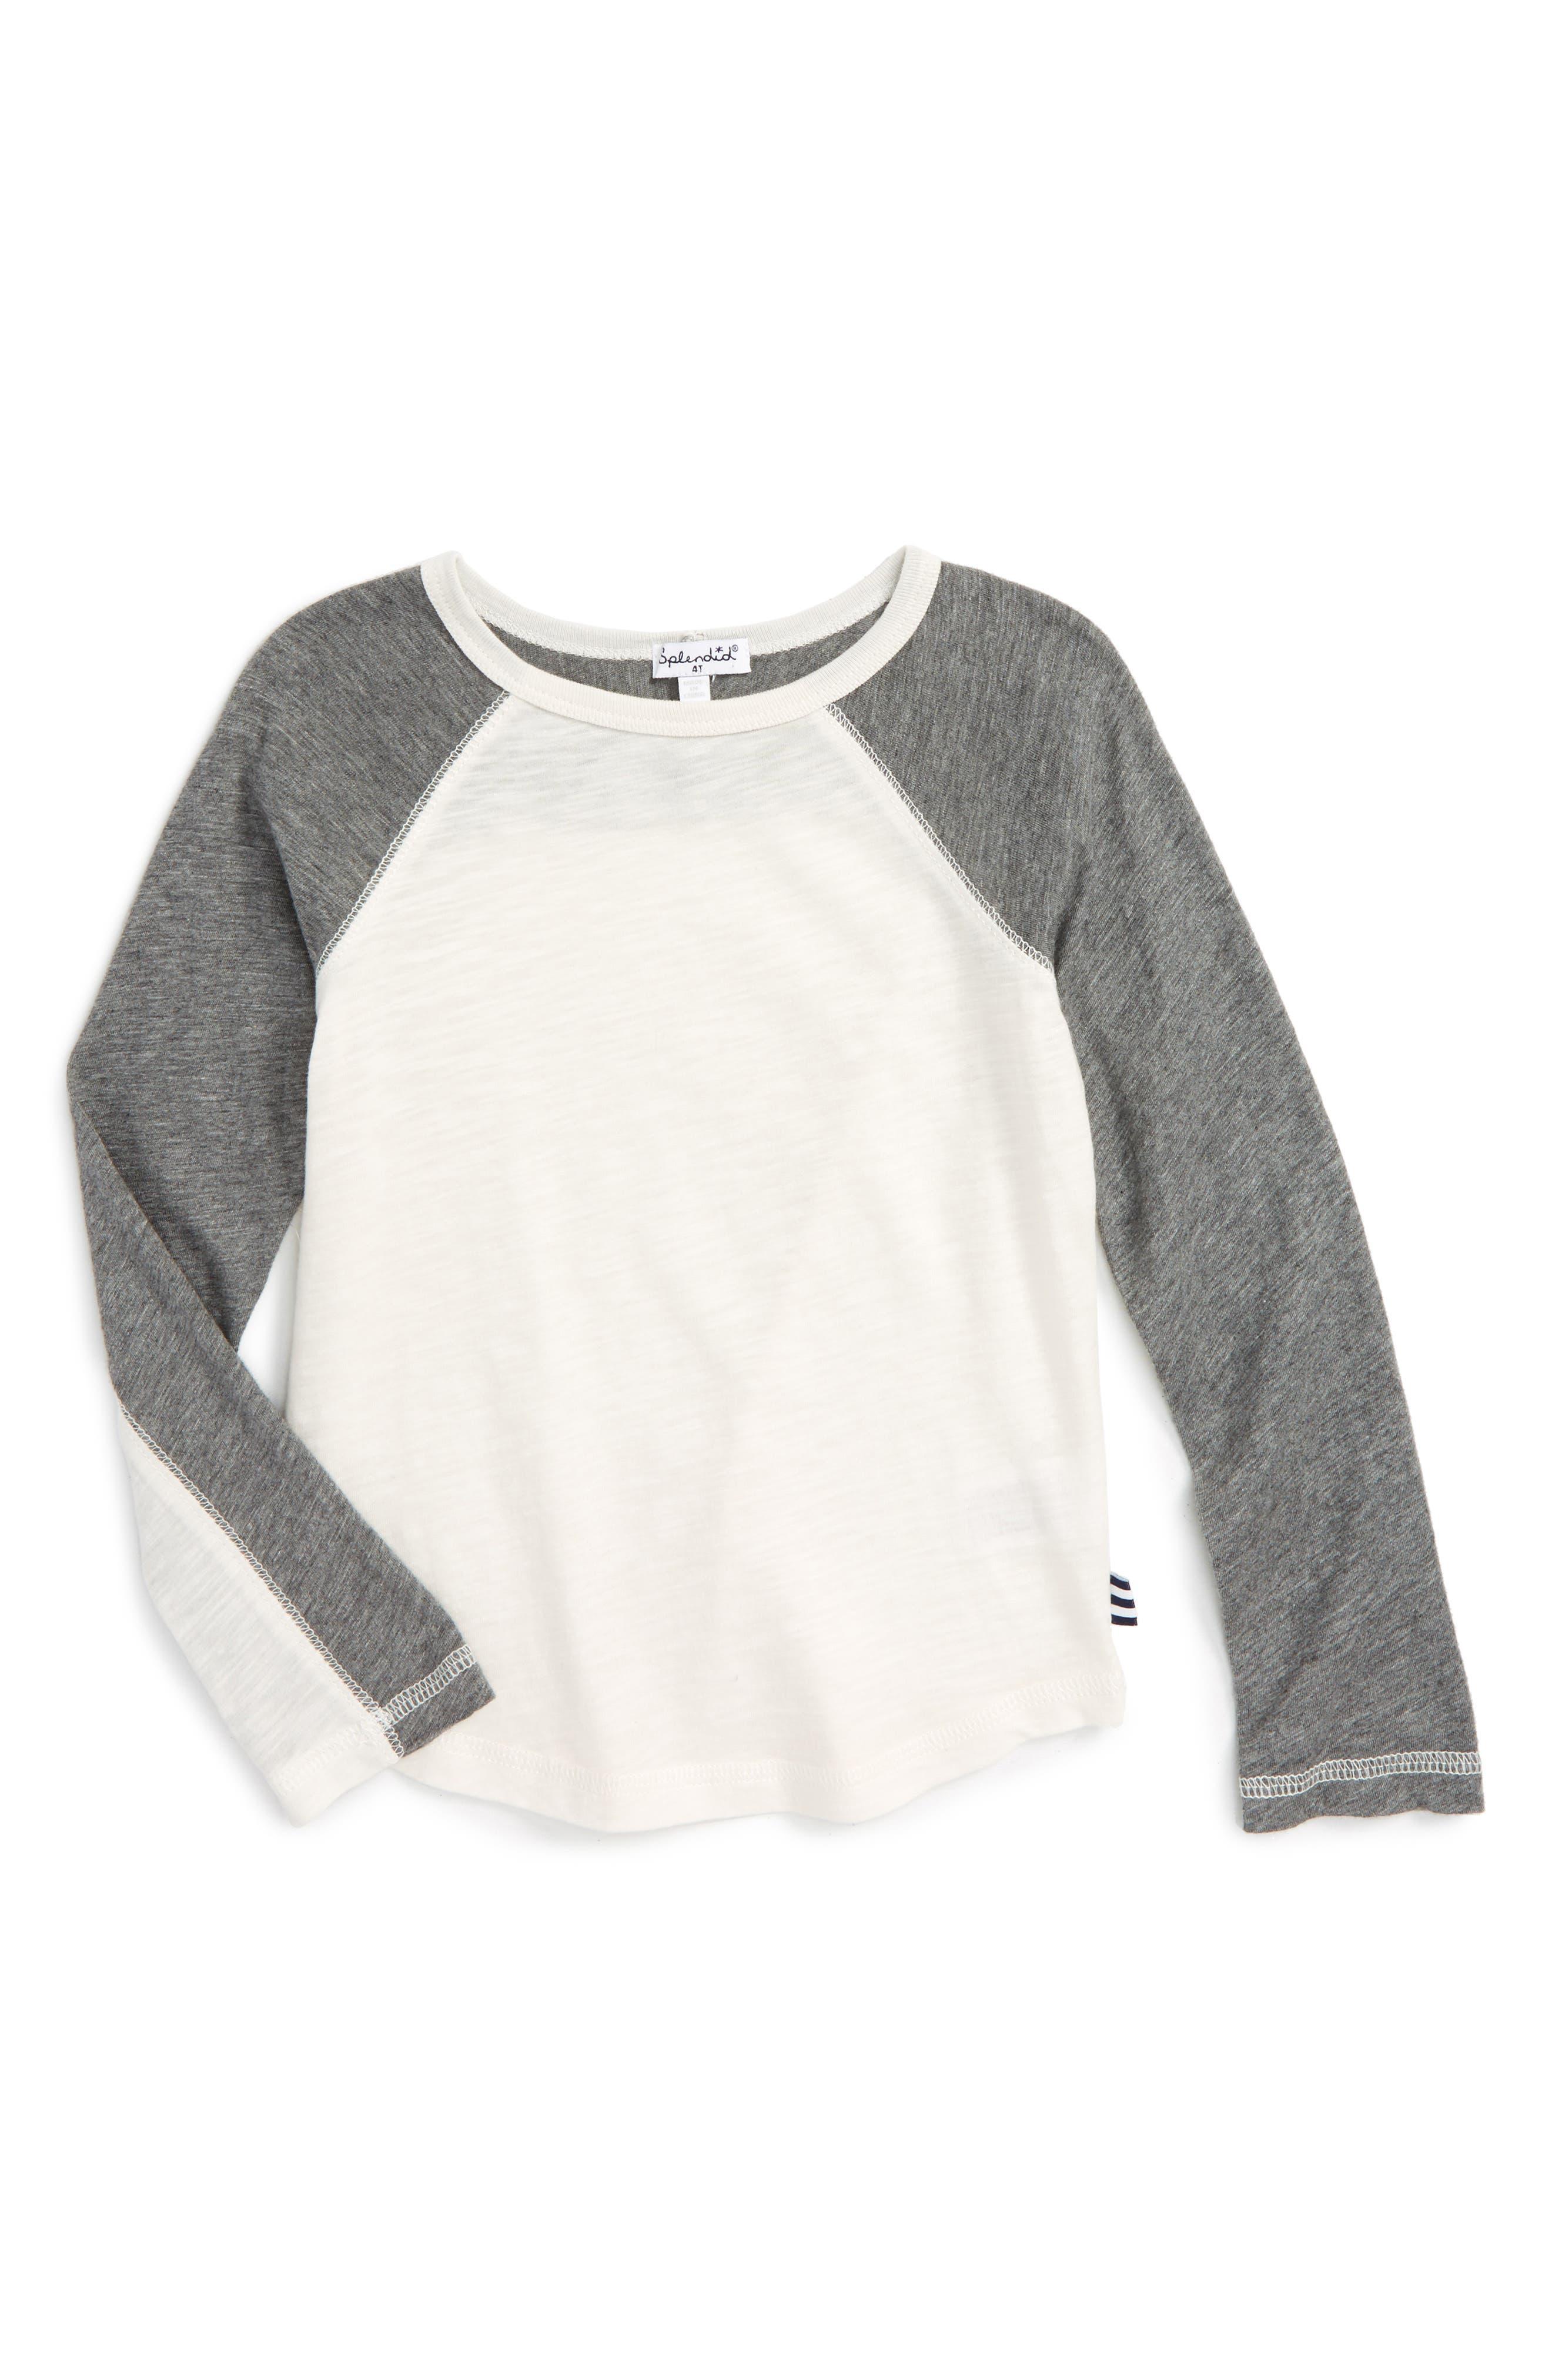 Slub Knit T-Shirt,                         Main,                         color, Off White Grey